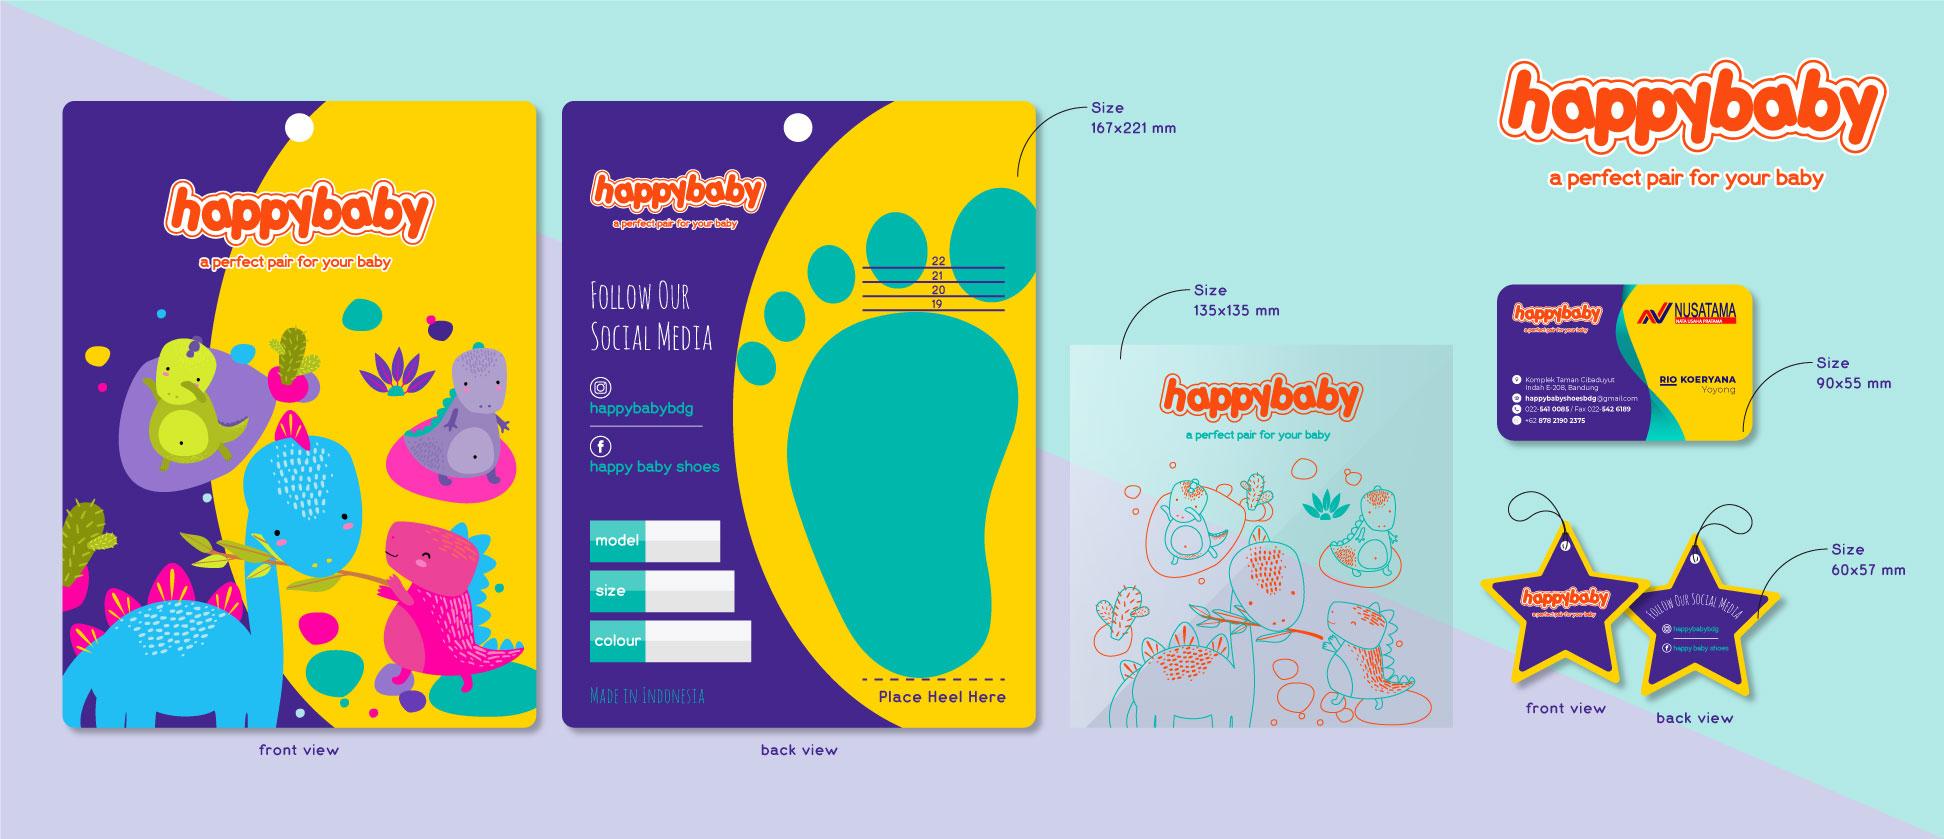 Happy baby fa 22a43186f2